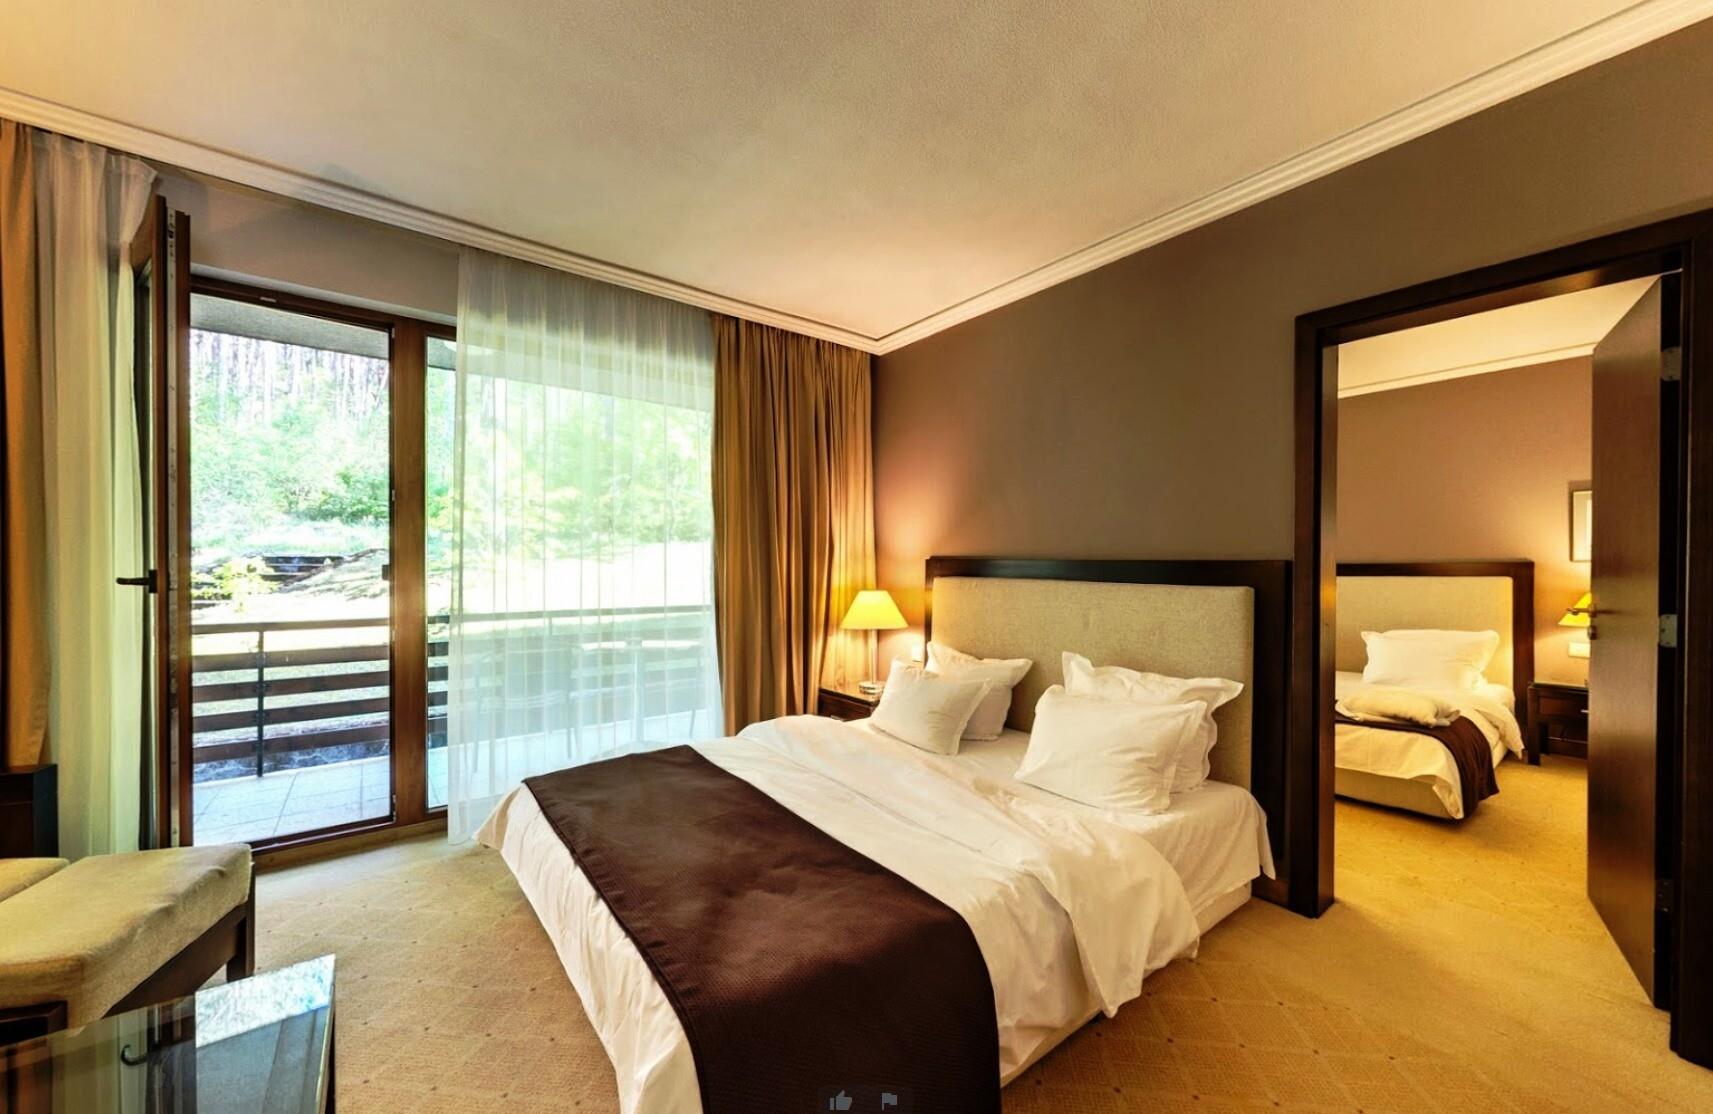 Спа Хотел Велина 4* - двуспален апартамент